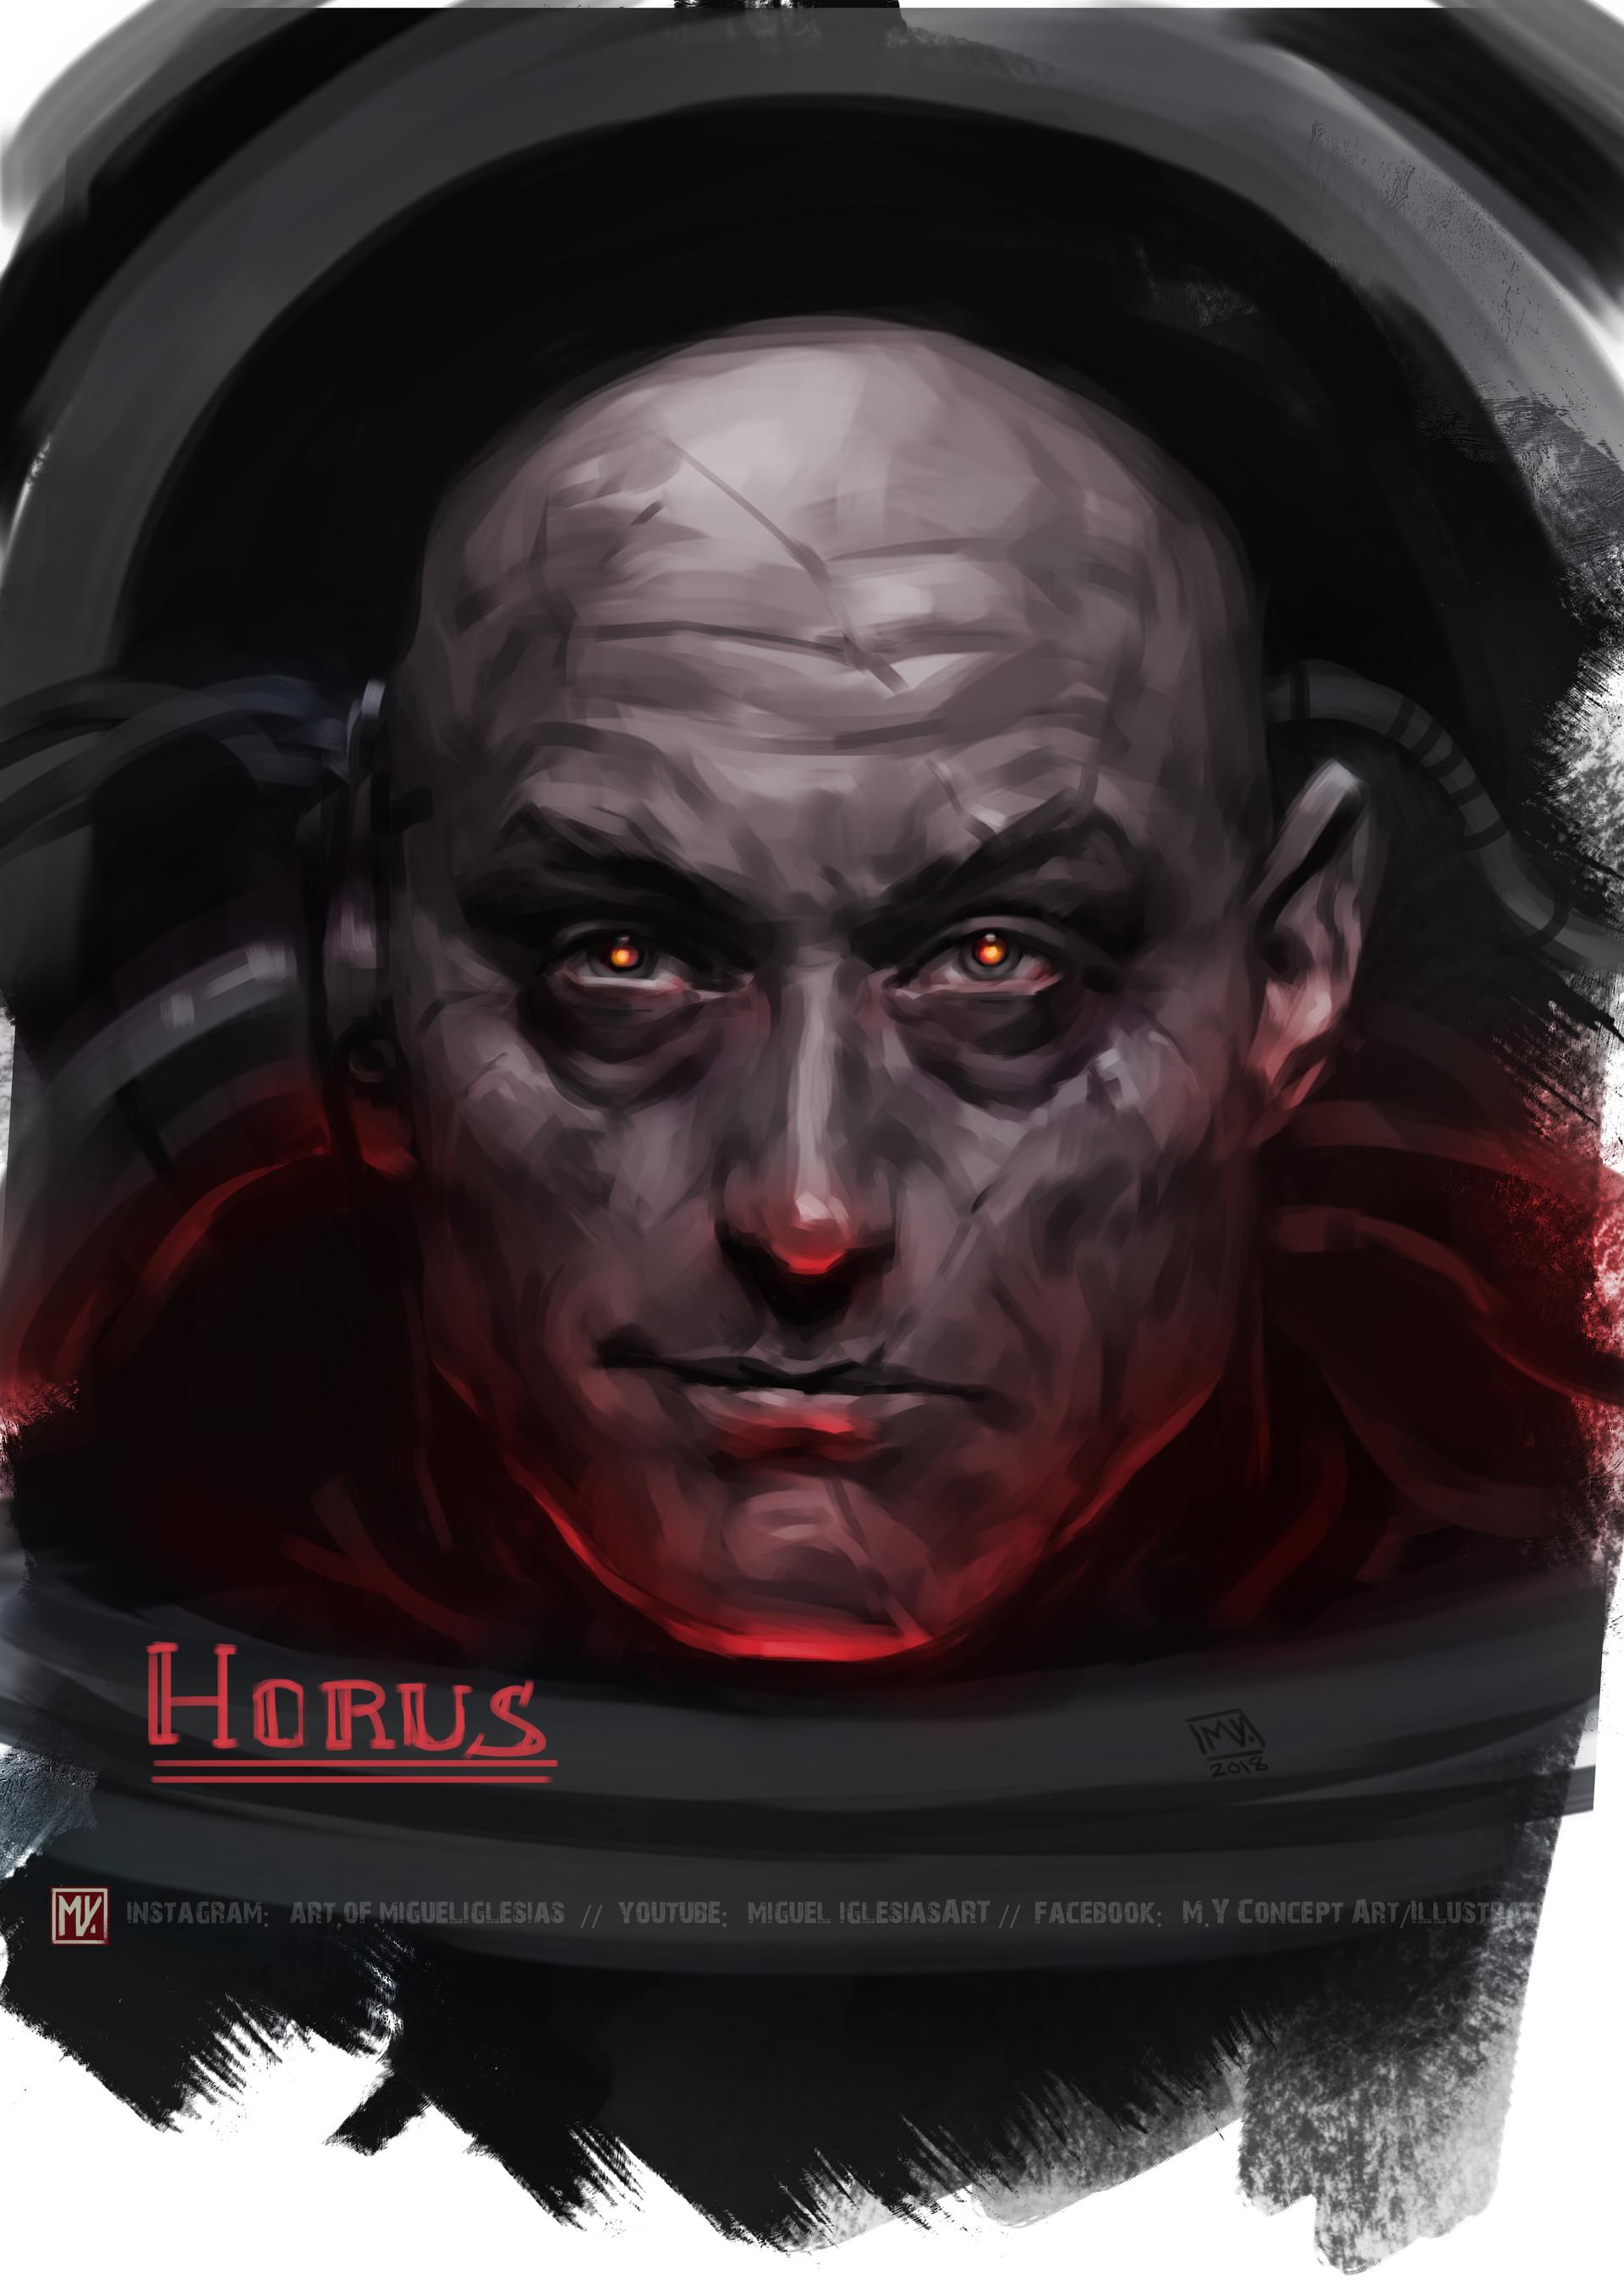 Miguel iglesias horus2 portrait colored artstation